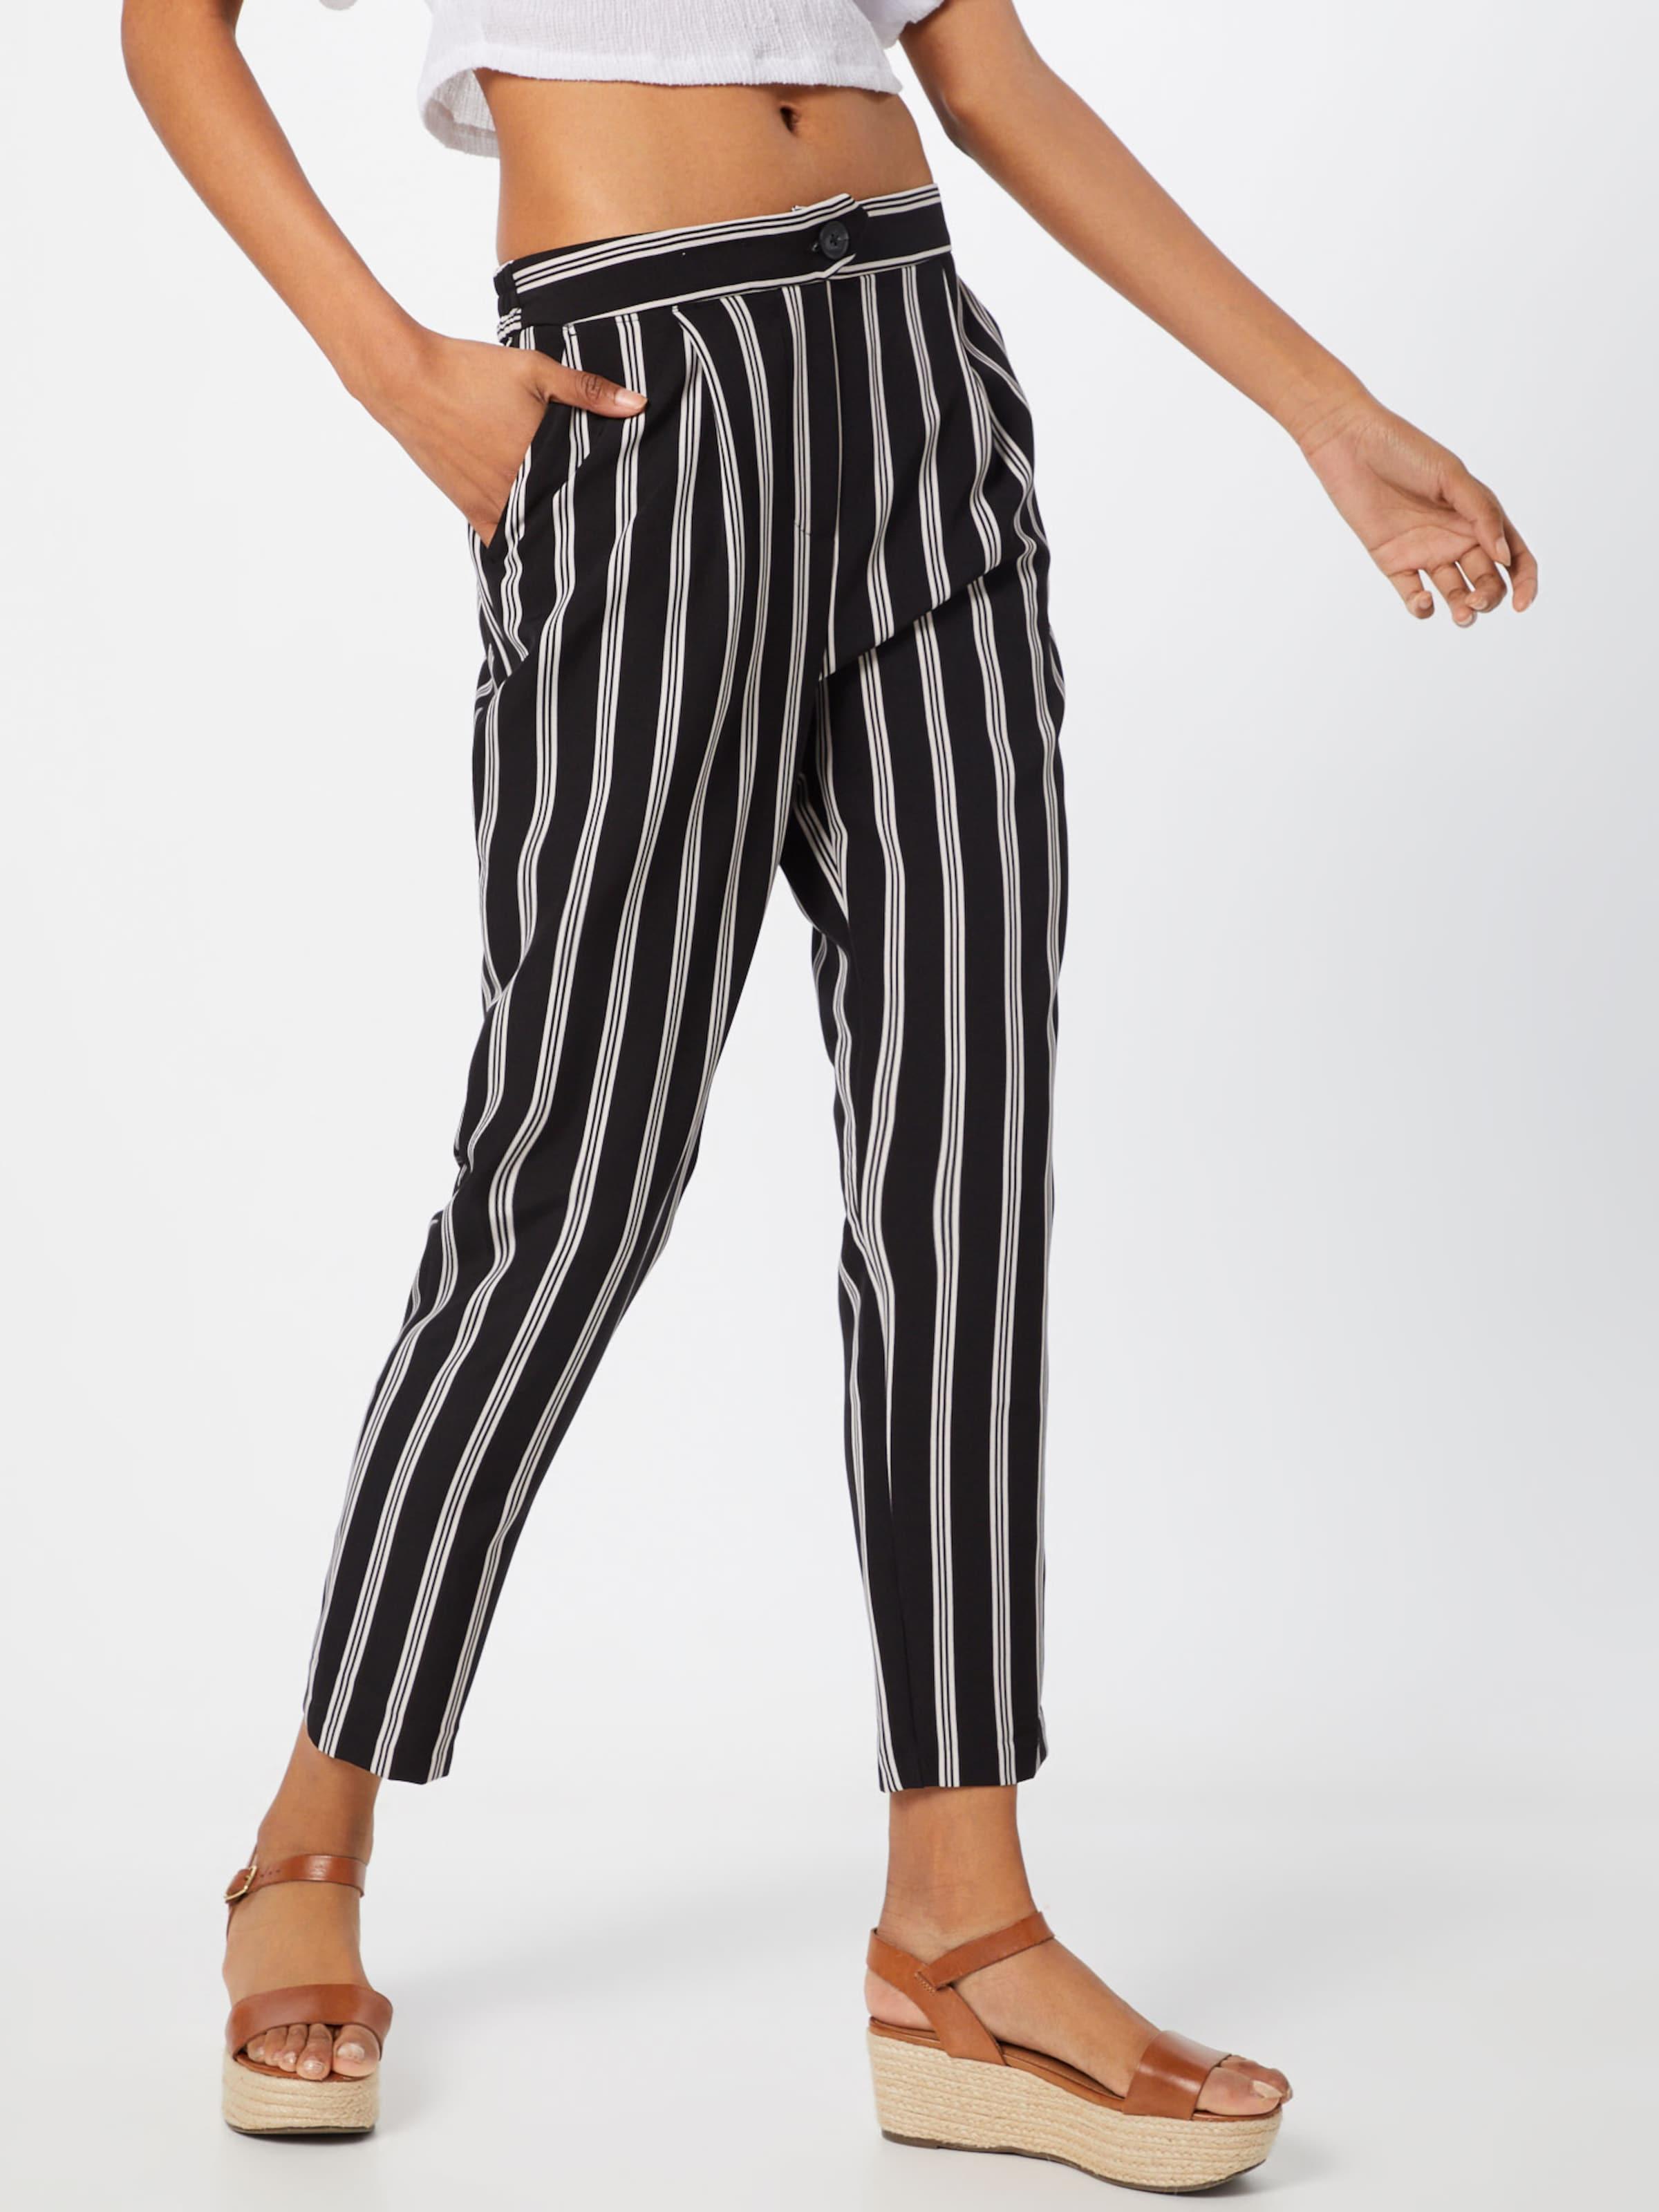 Stripe' Seb New Hose Look 'je In SchwarzWeiß ordCxBQeWE